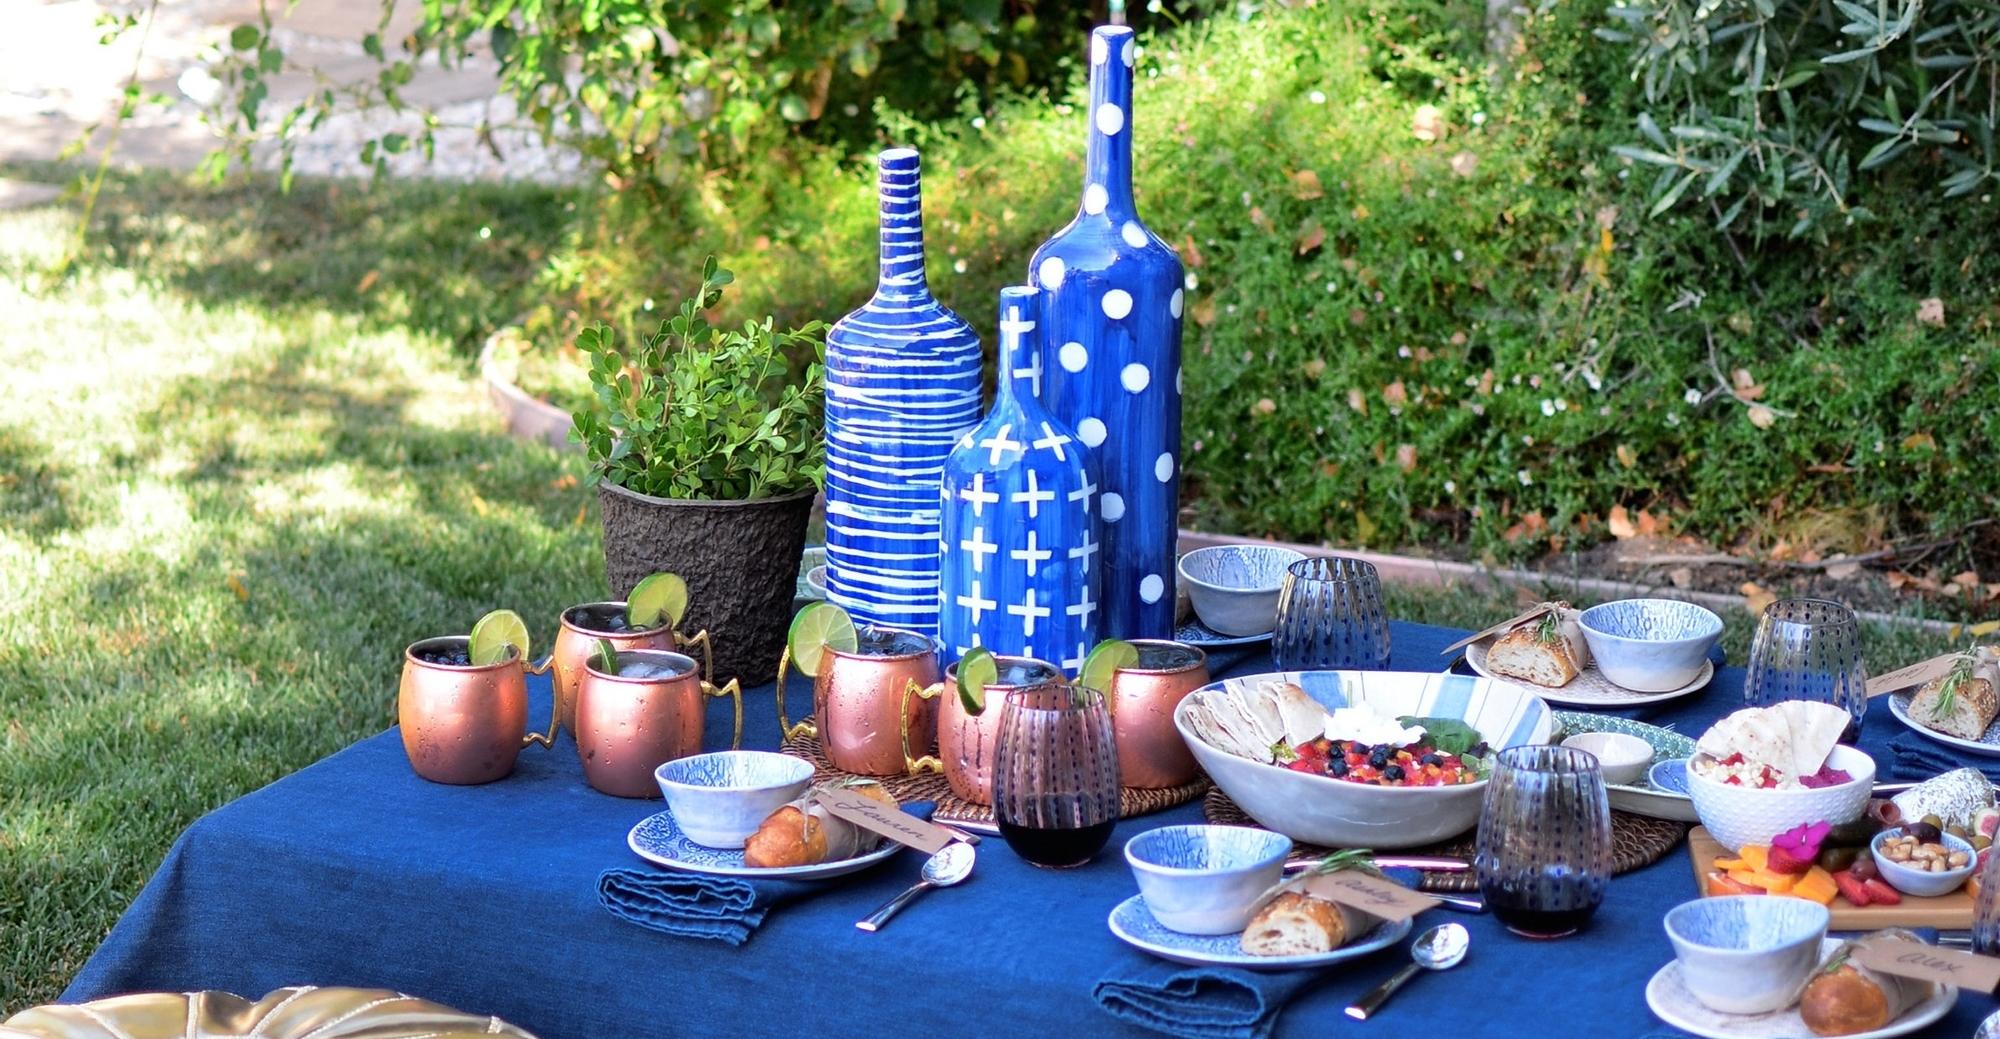 Wonki-Ware-Lenox-Table-and-Dine-Deborah-Shearer